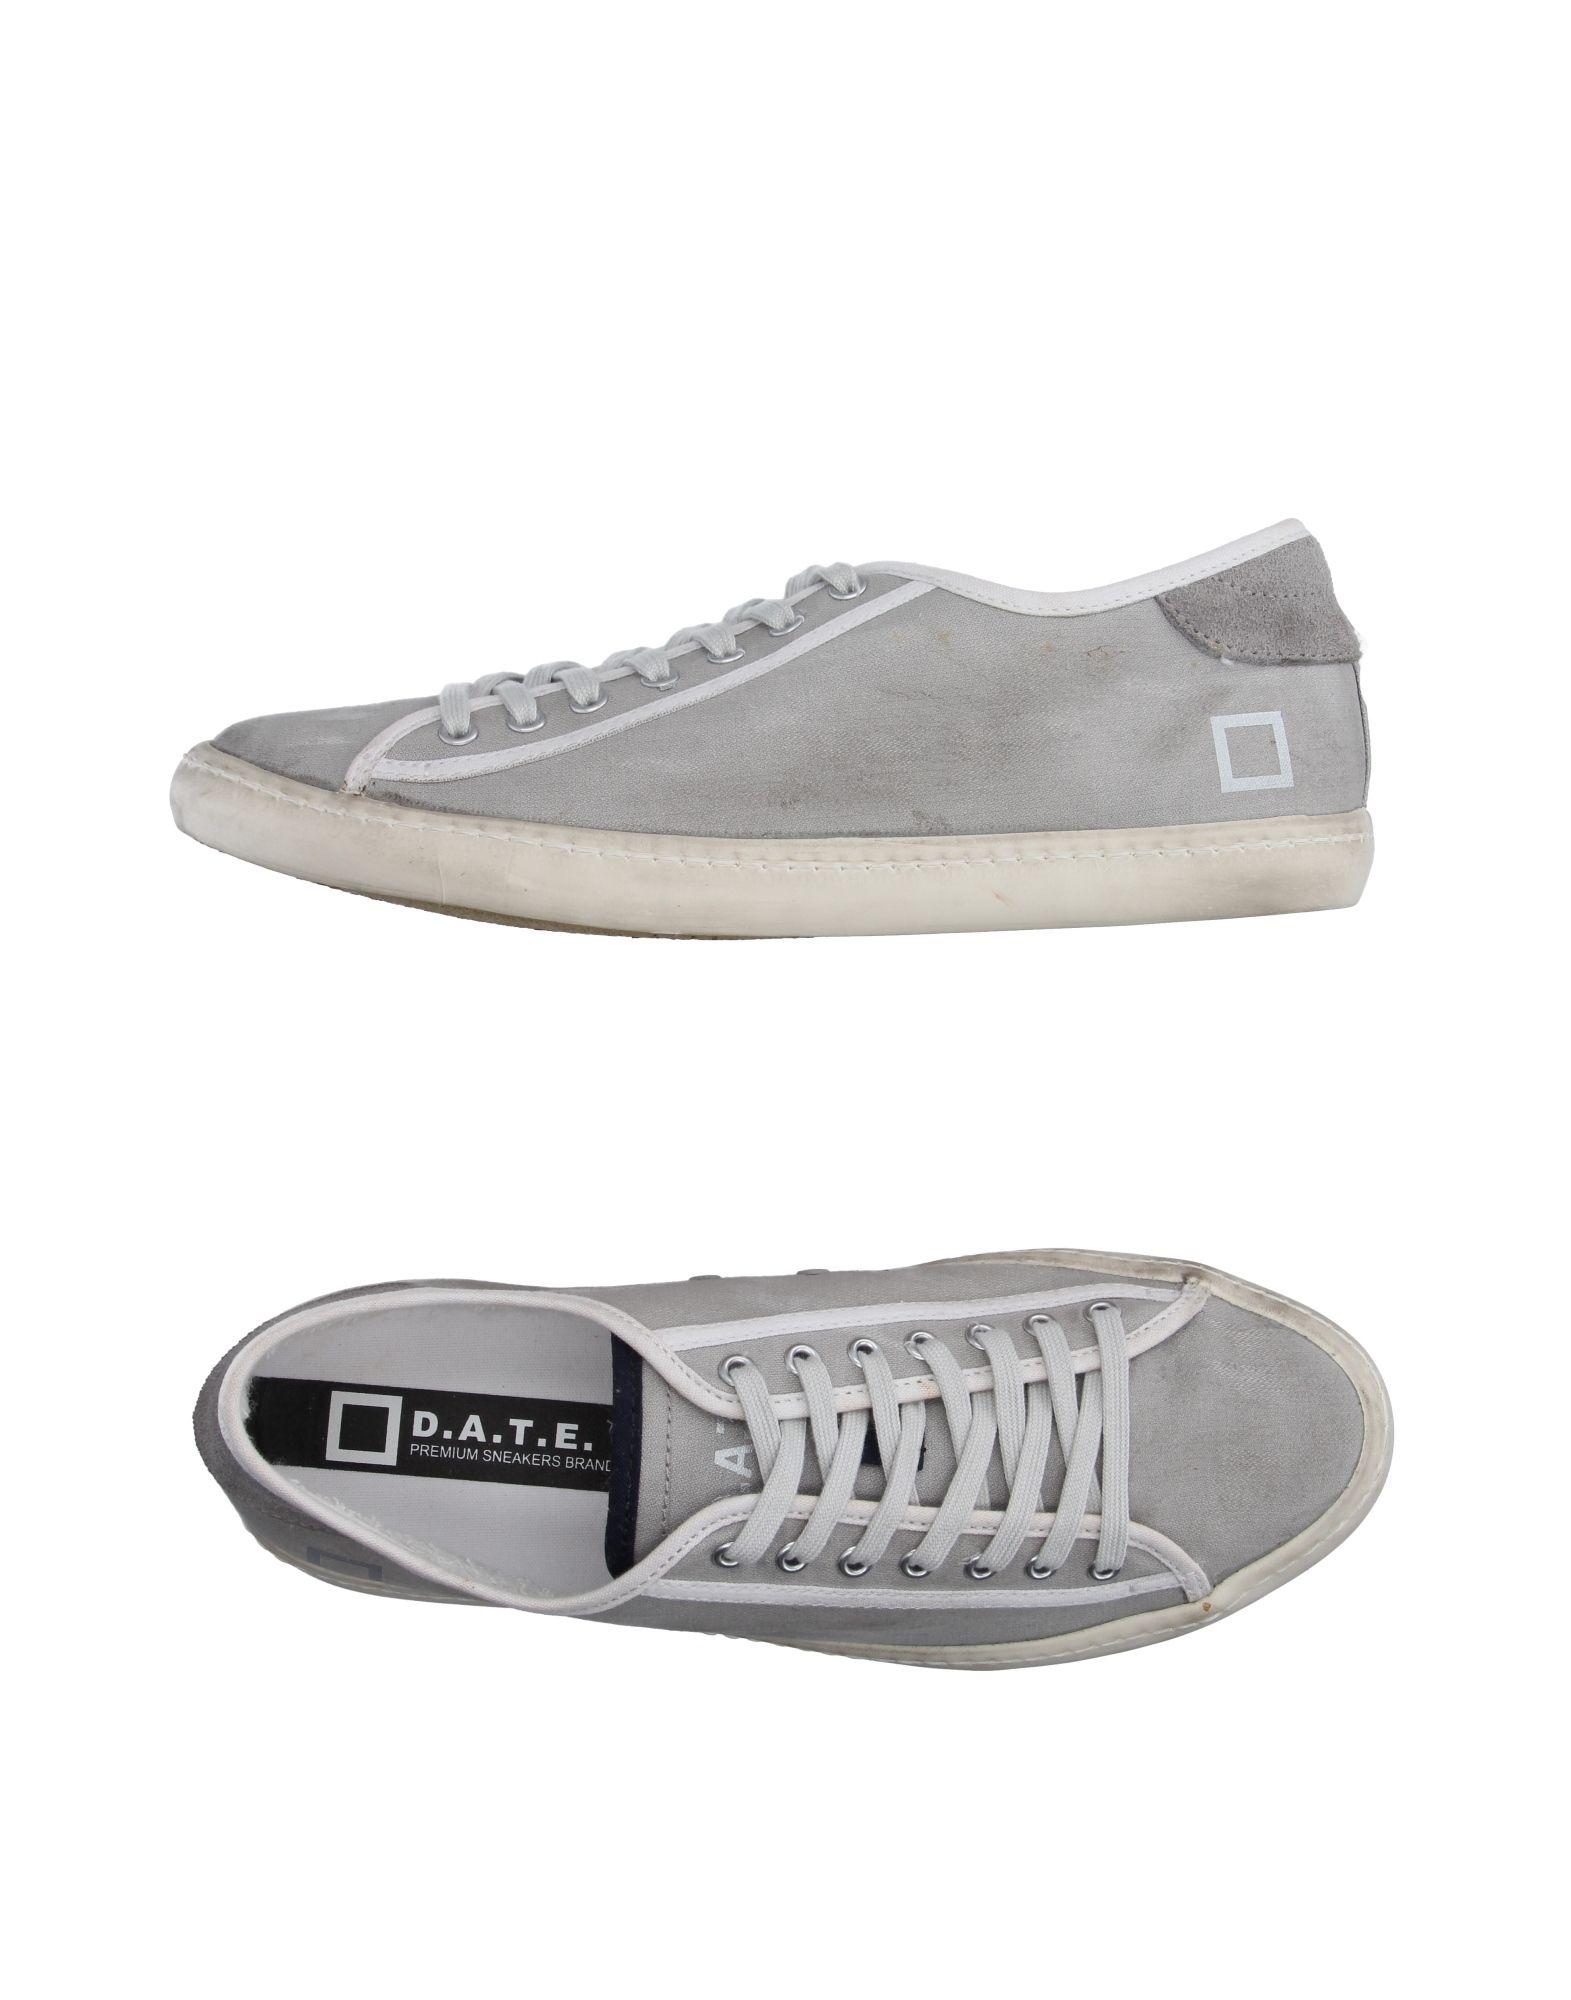 D.A.T.E. Sneakers Sneakers - Men D.A.T.E. Sneakers D.A.T.E. online on  United Kingdom - 11117487CE 2f41ff